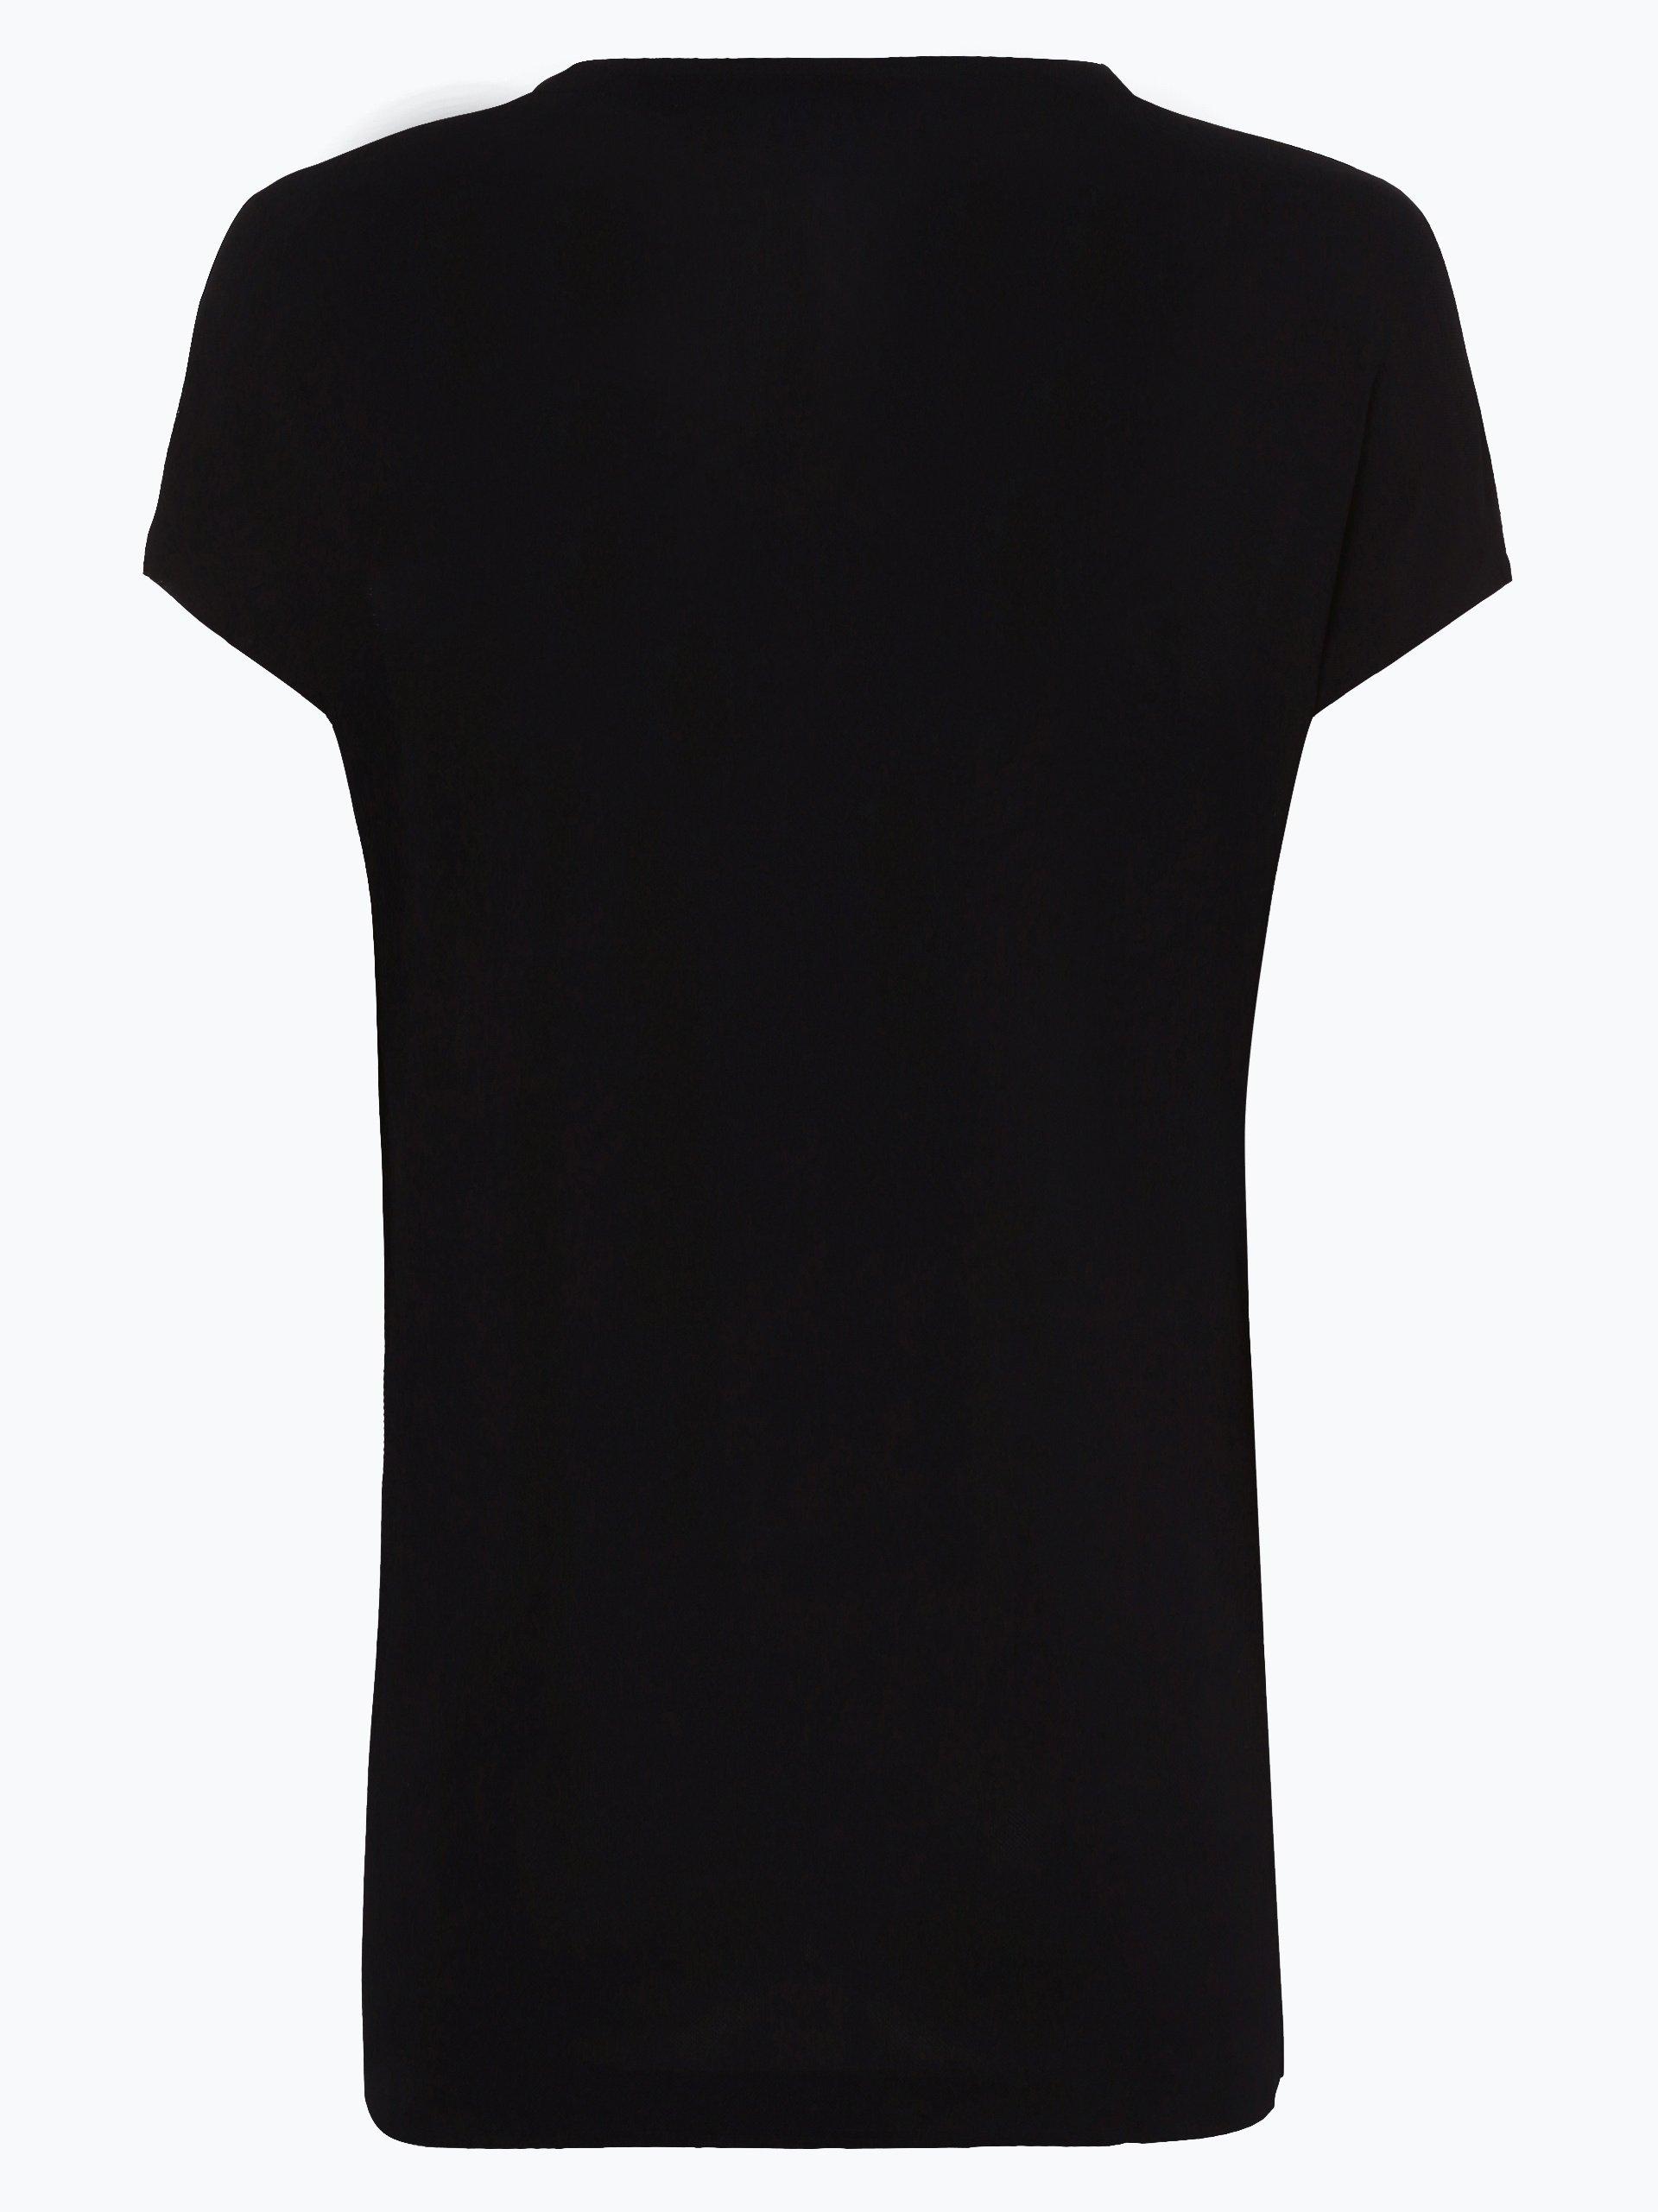 BOSS T-shirt damski – Ediele